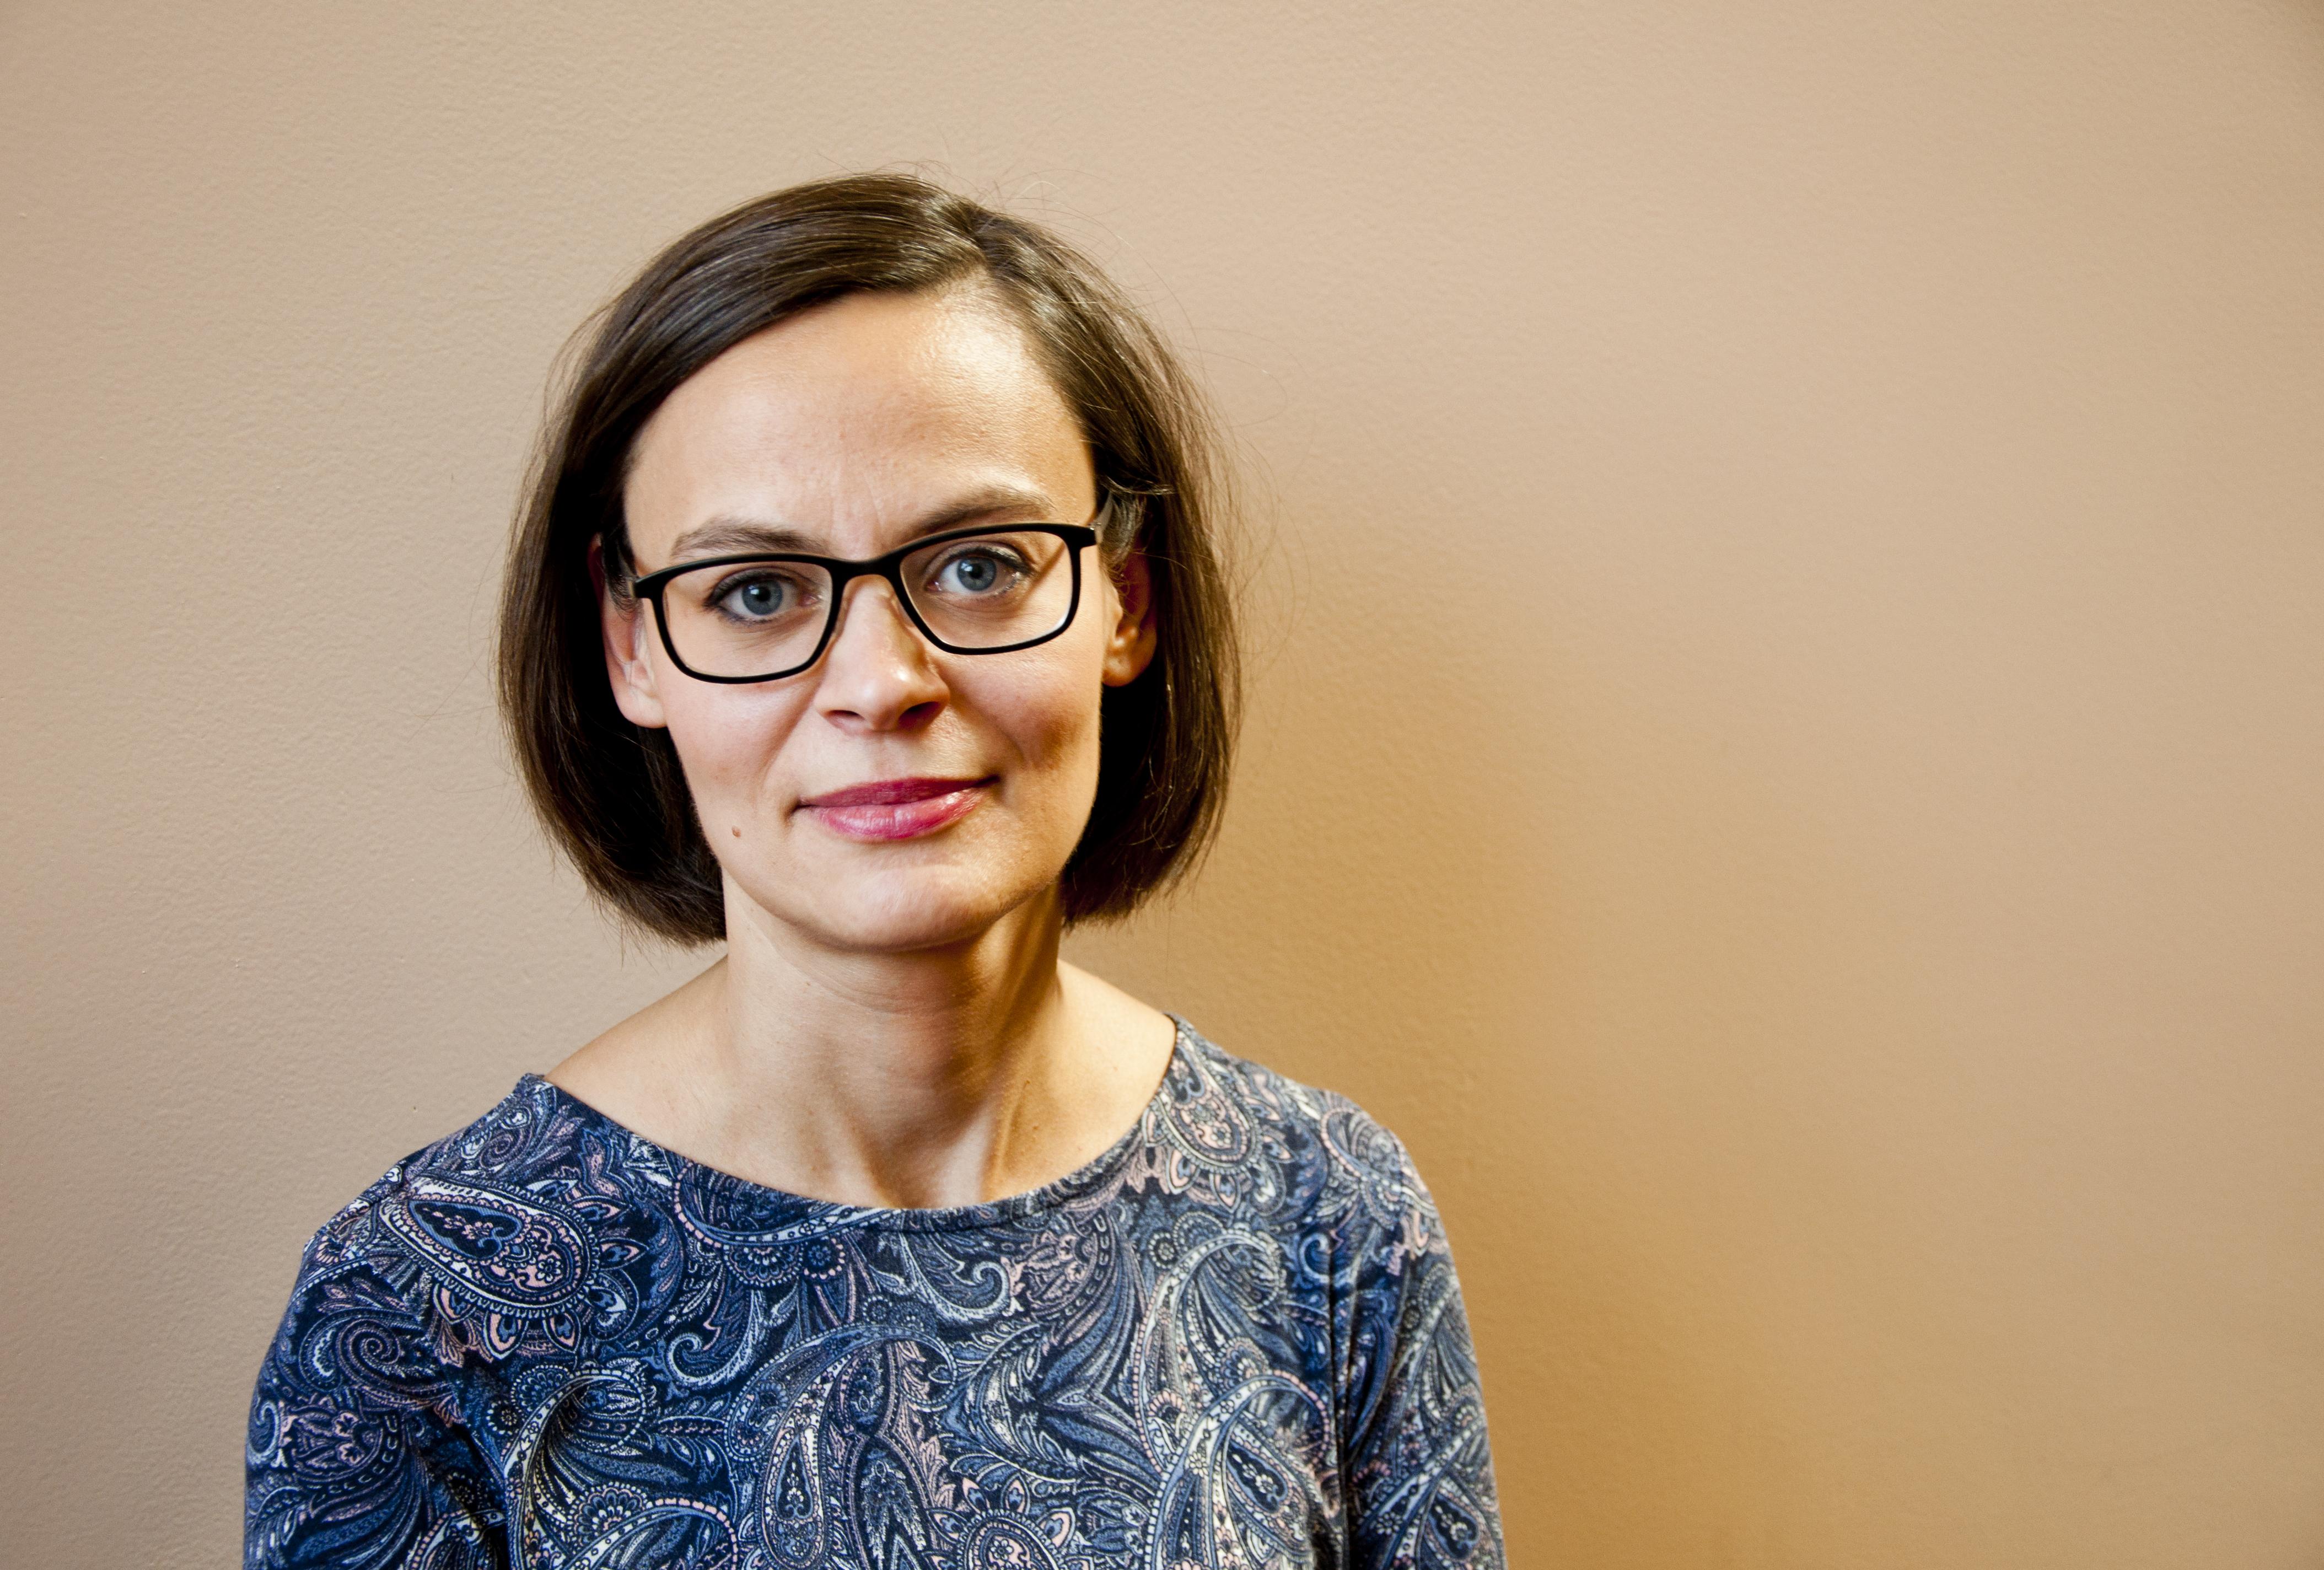 Anna-Karin Tötterman